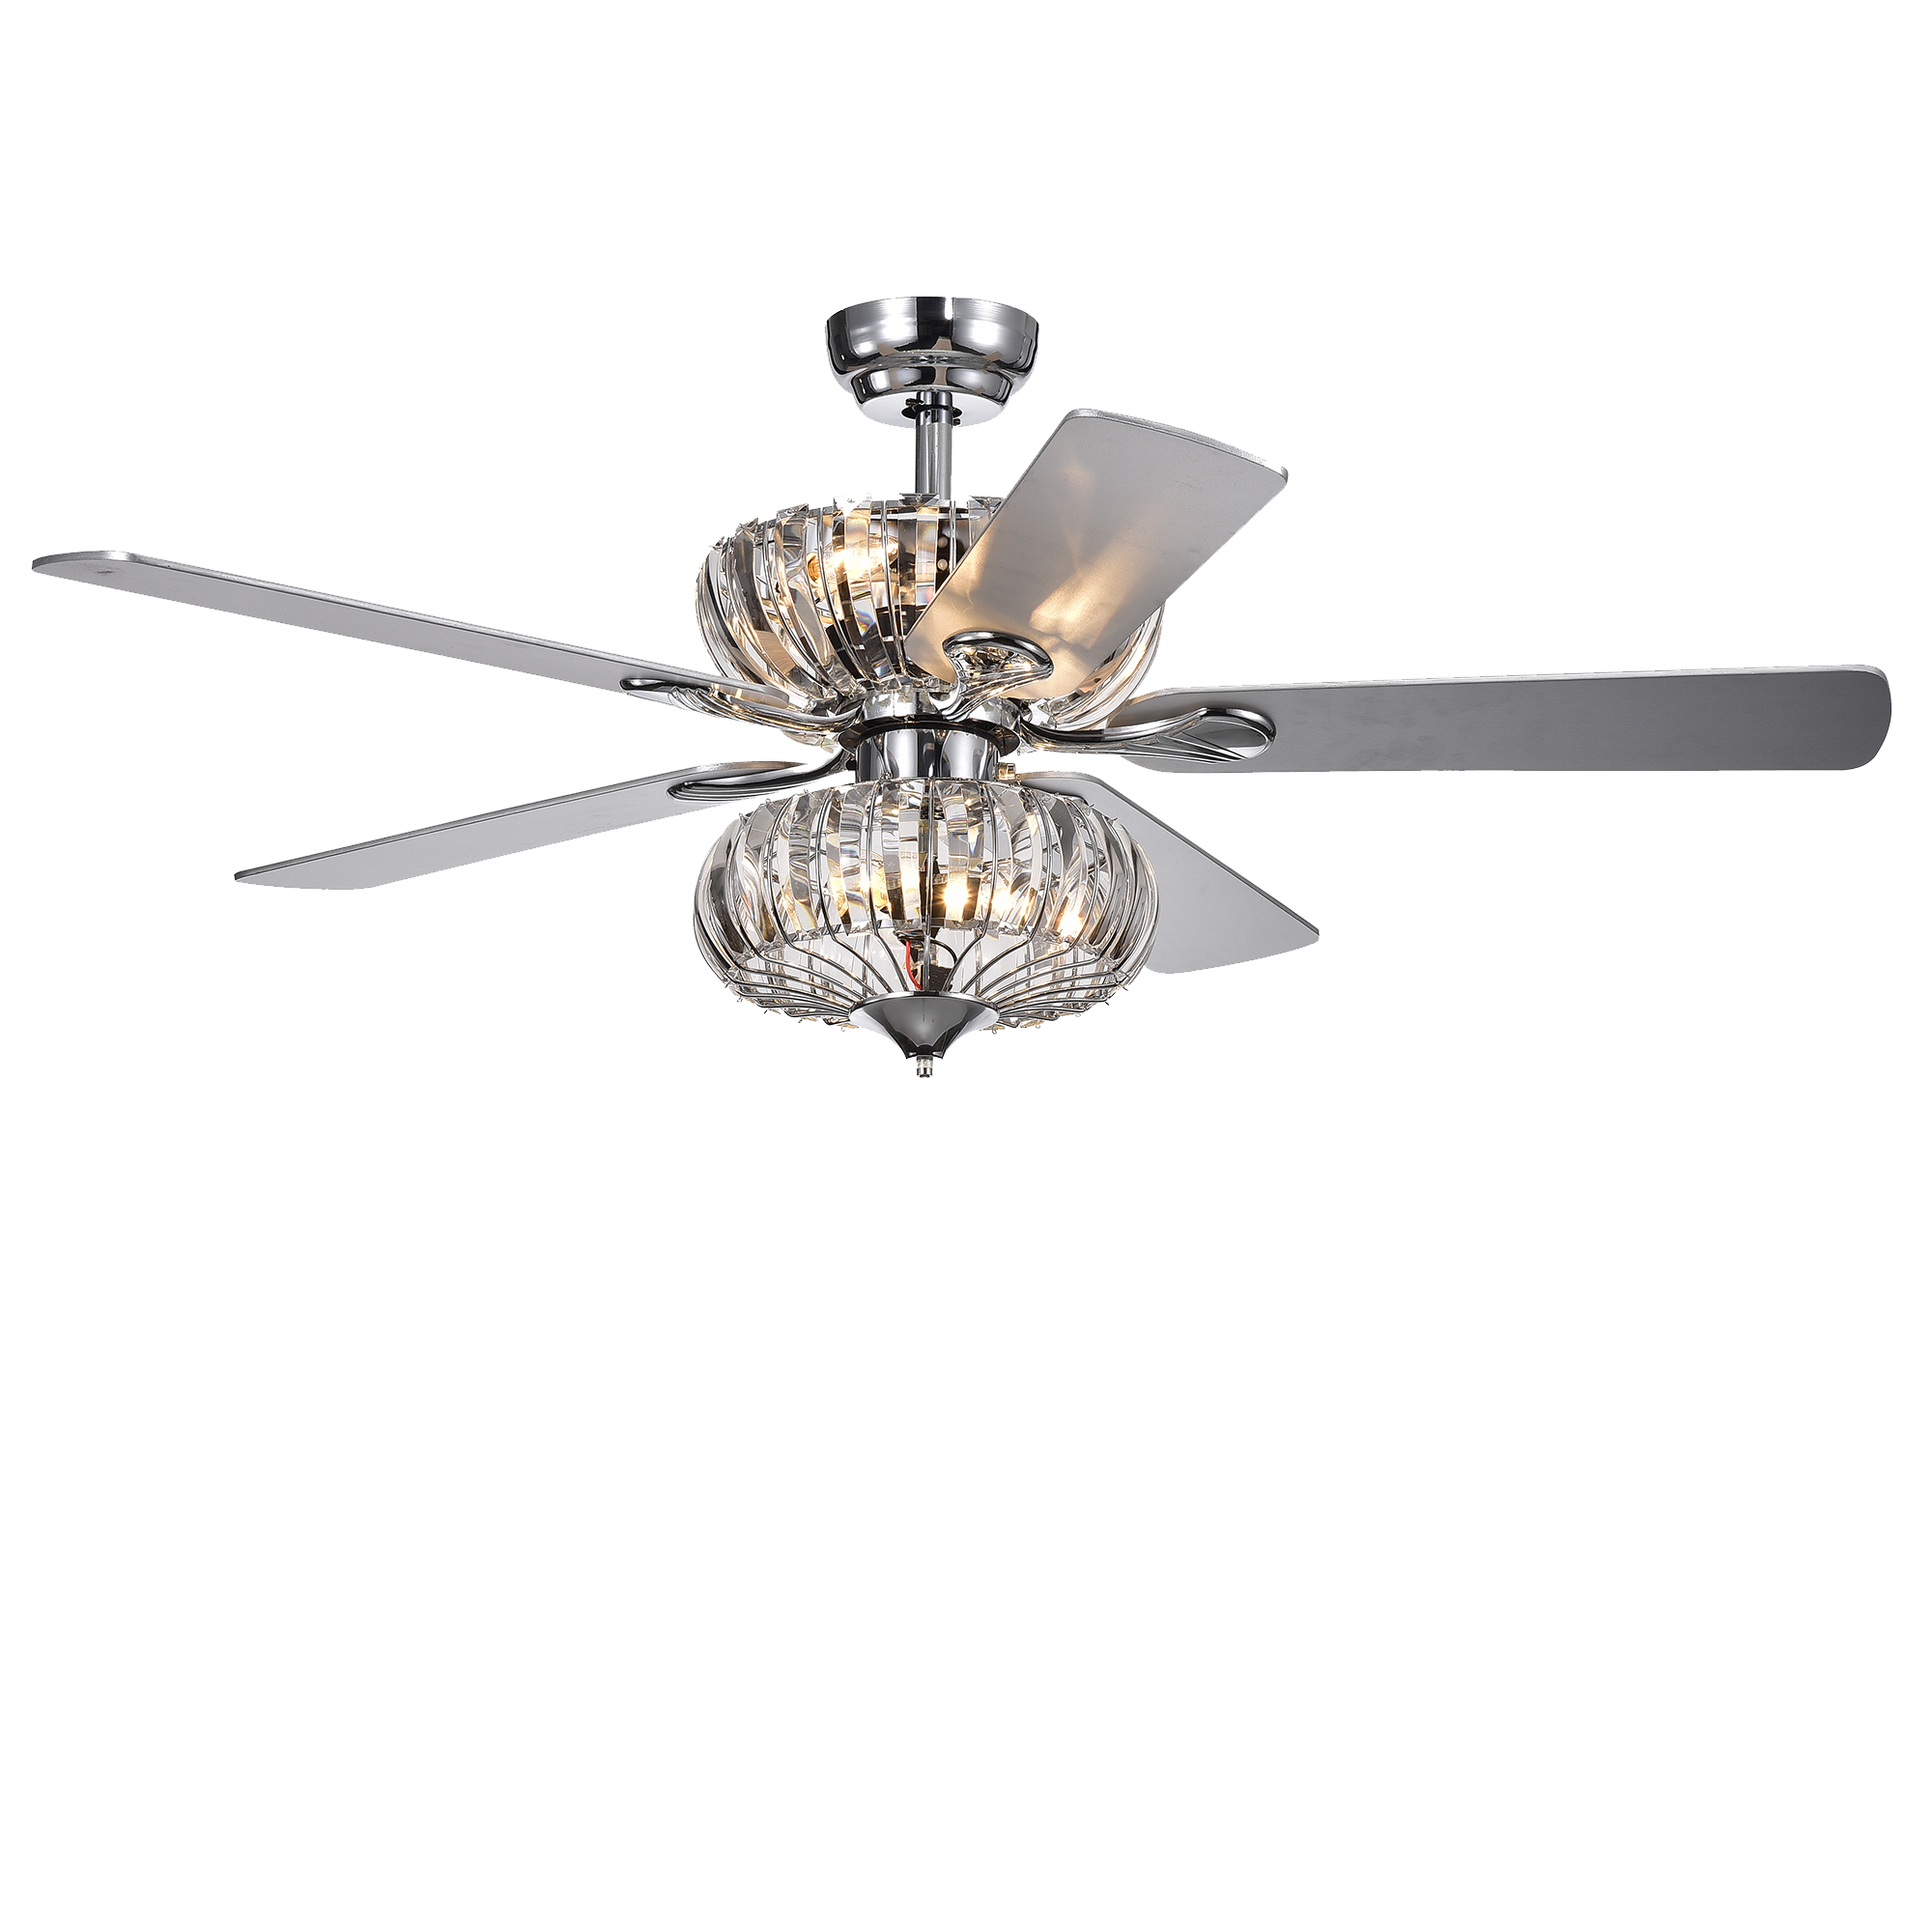 Kyana 6 Light Crystal 5 Blade 52 Inch Chrome Ceiling Fan With Remote Walmart Com